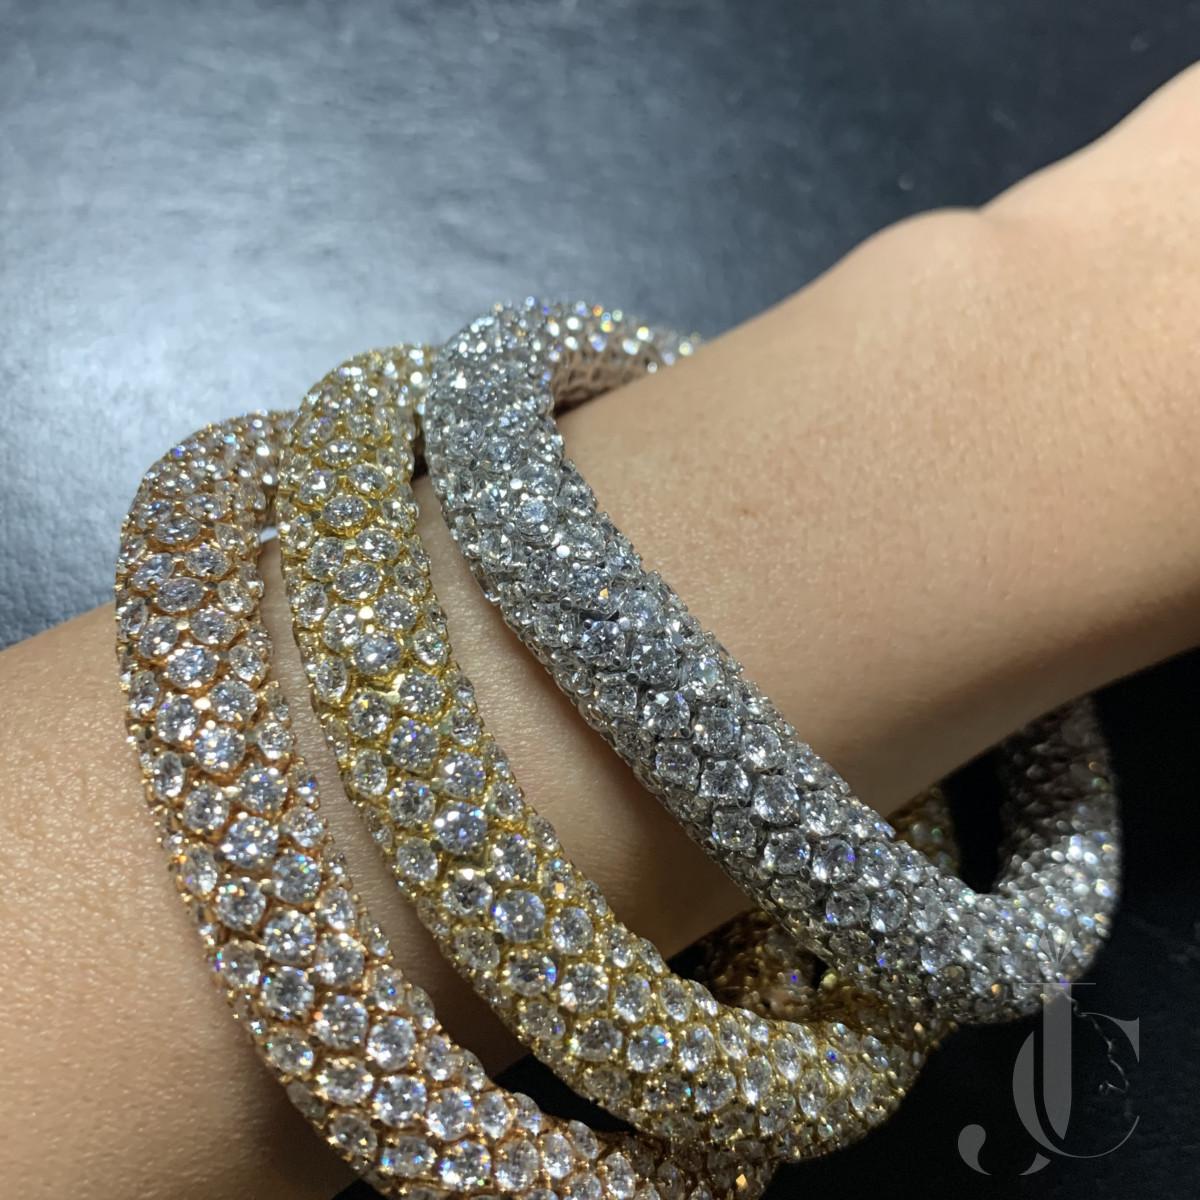 3 Color Gold Diamond Bracelet/Necklace by Faraone Milano